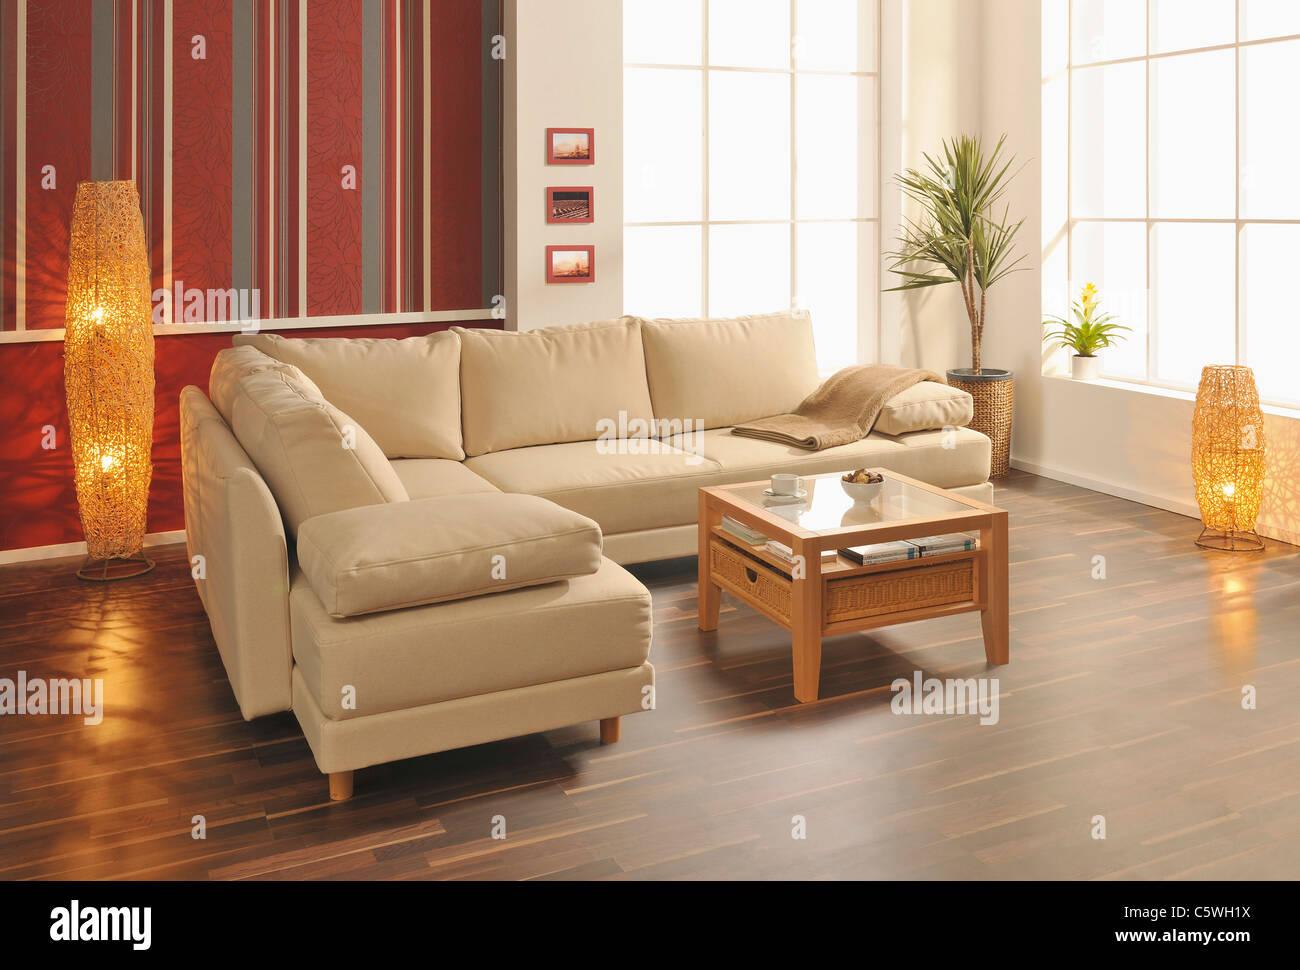 Vista del salón moderno con suelo de madera Imagen De Stock